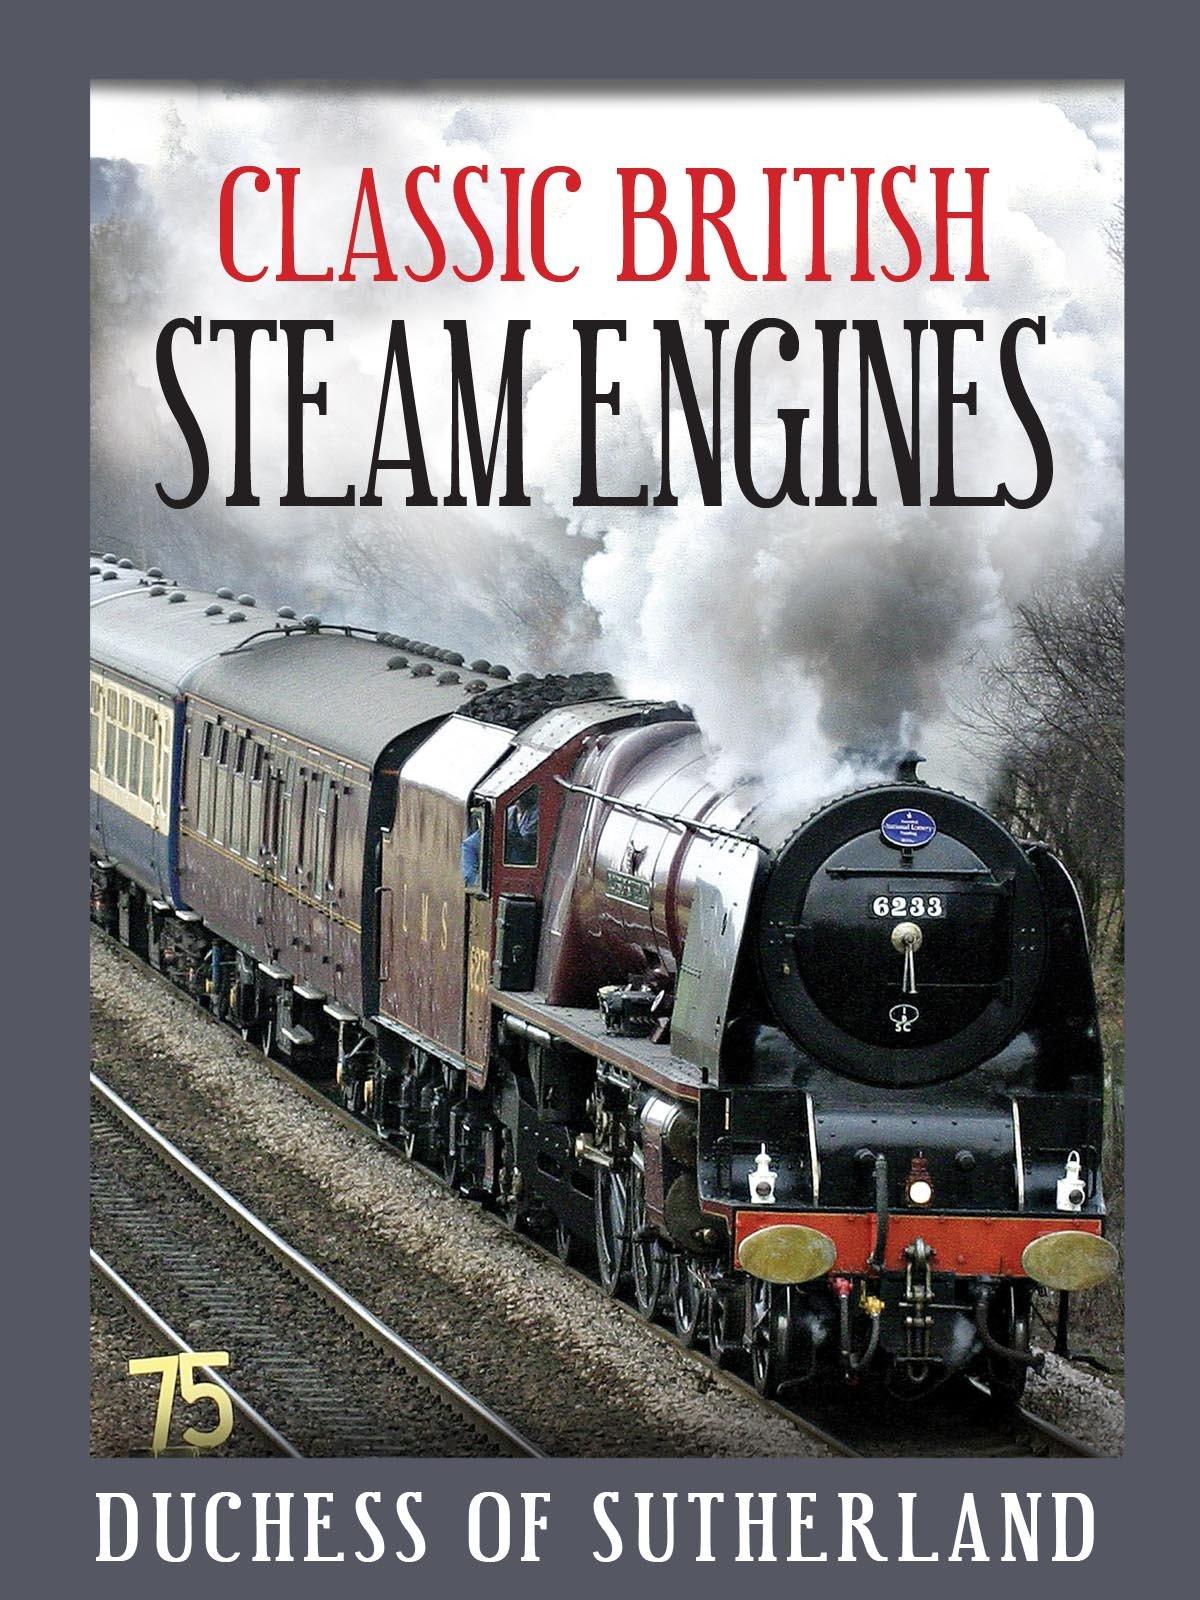 Classic British Steam Engines: Duchess Of Sutherland on Amazon Prime Video UK